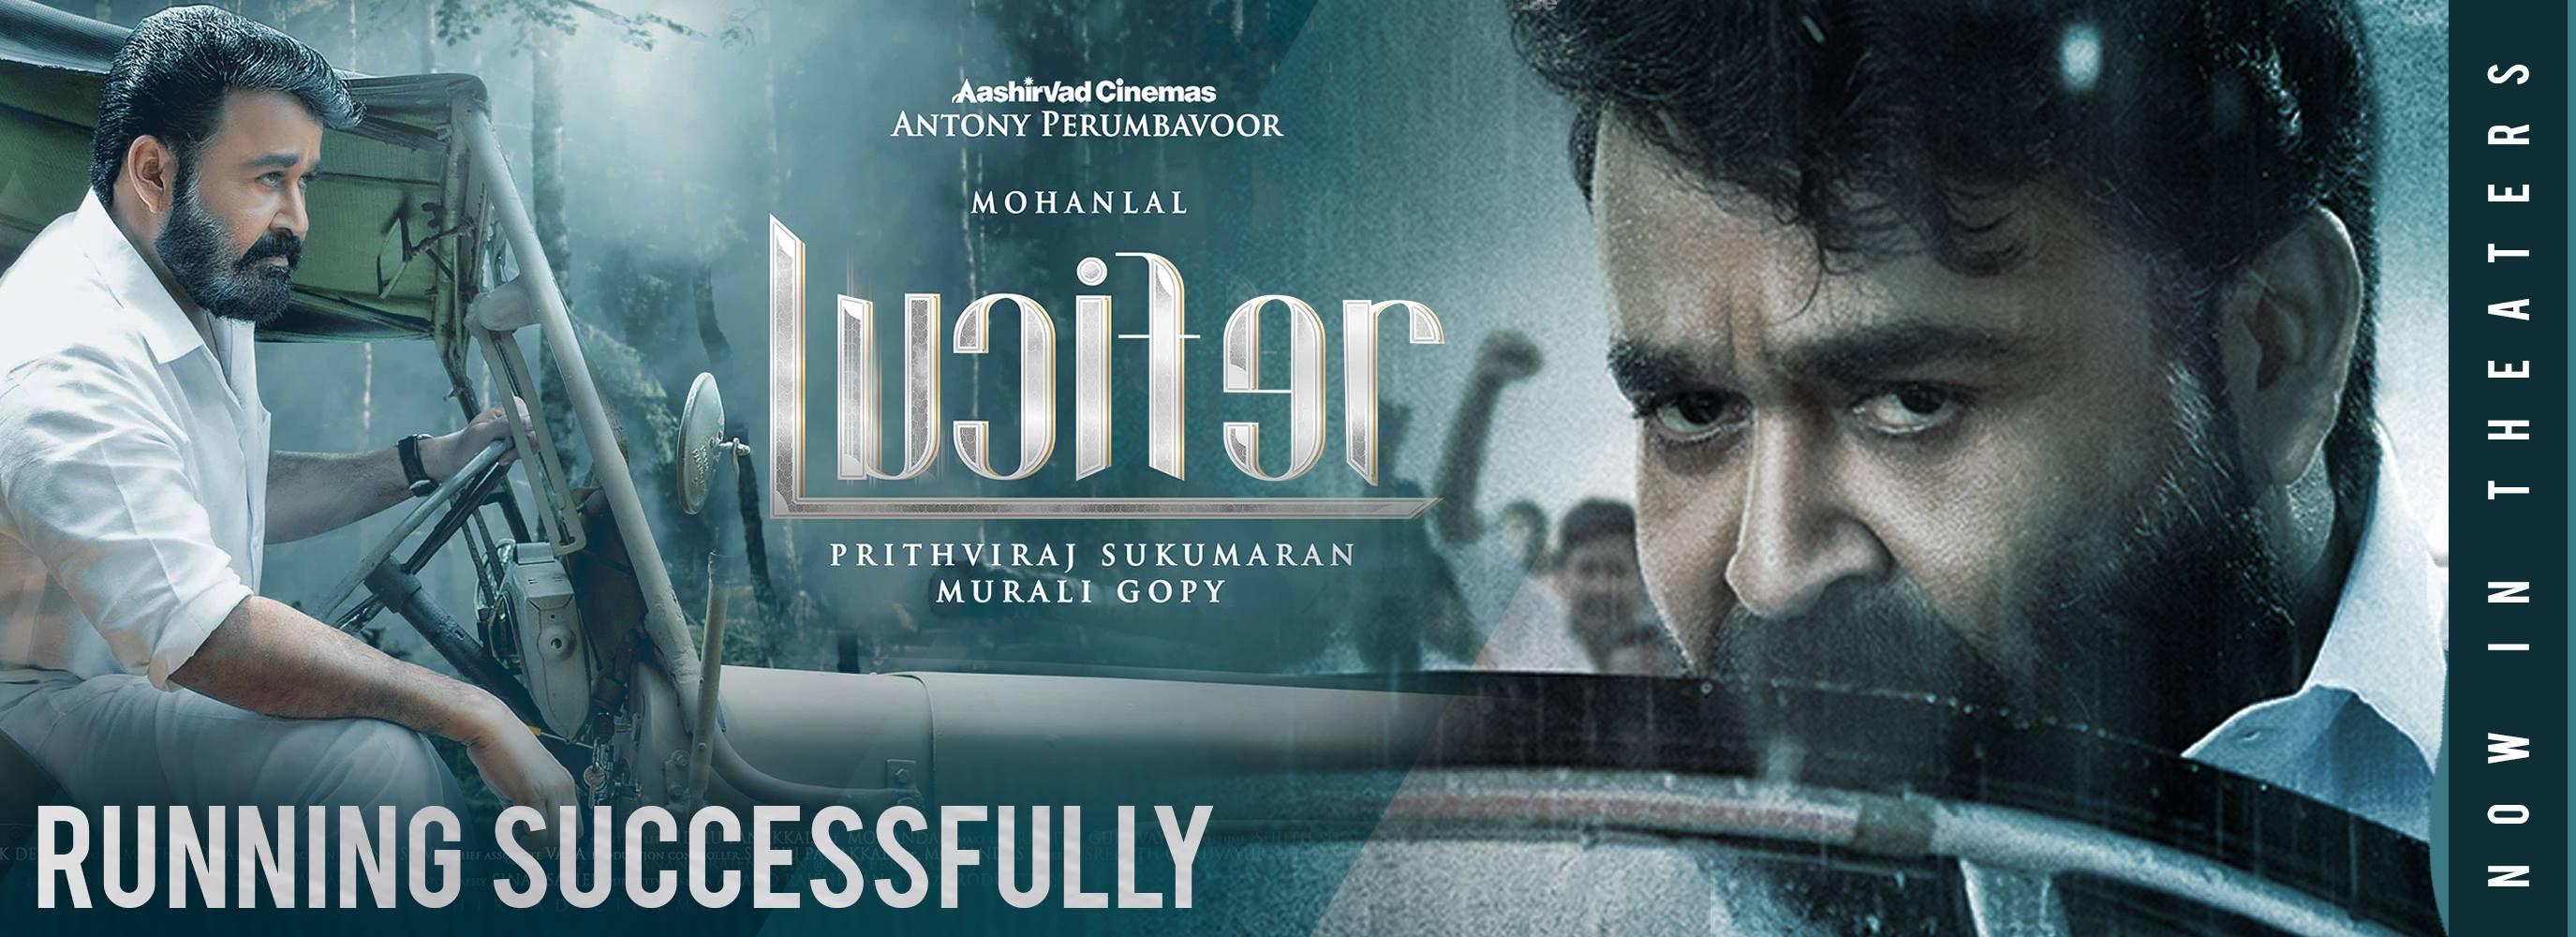 ,lucifer-malayalam-movie-review-veeyen